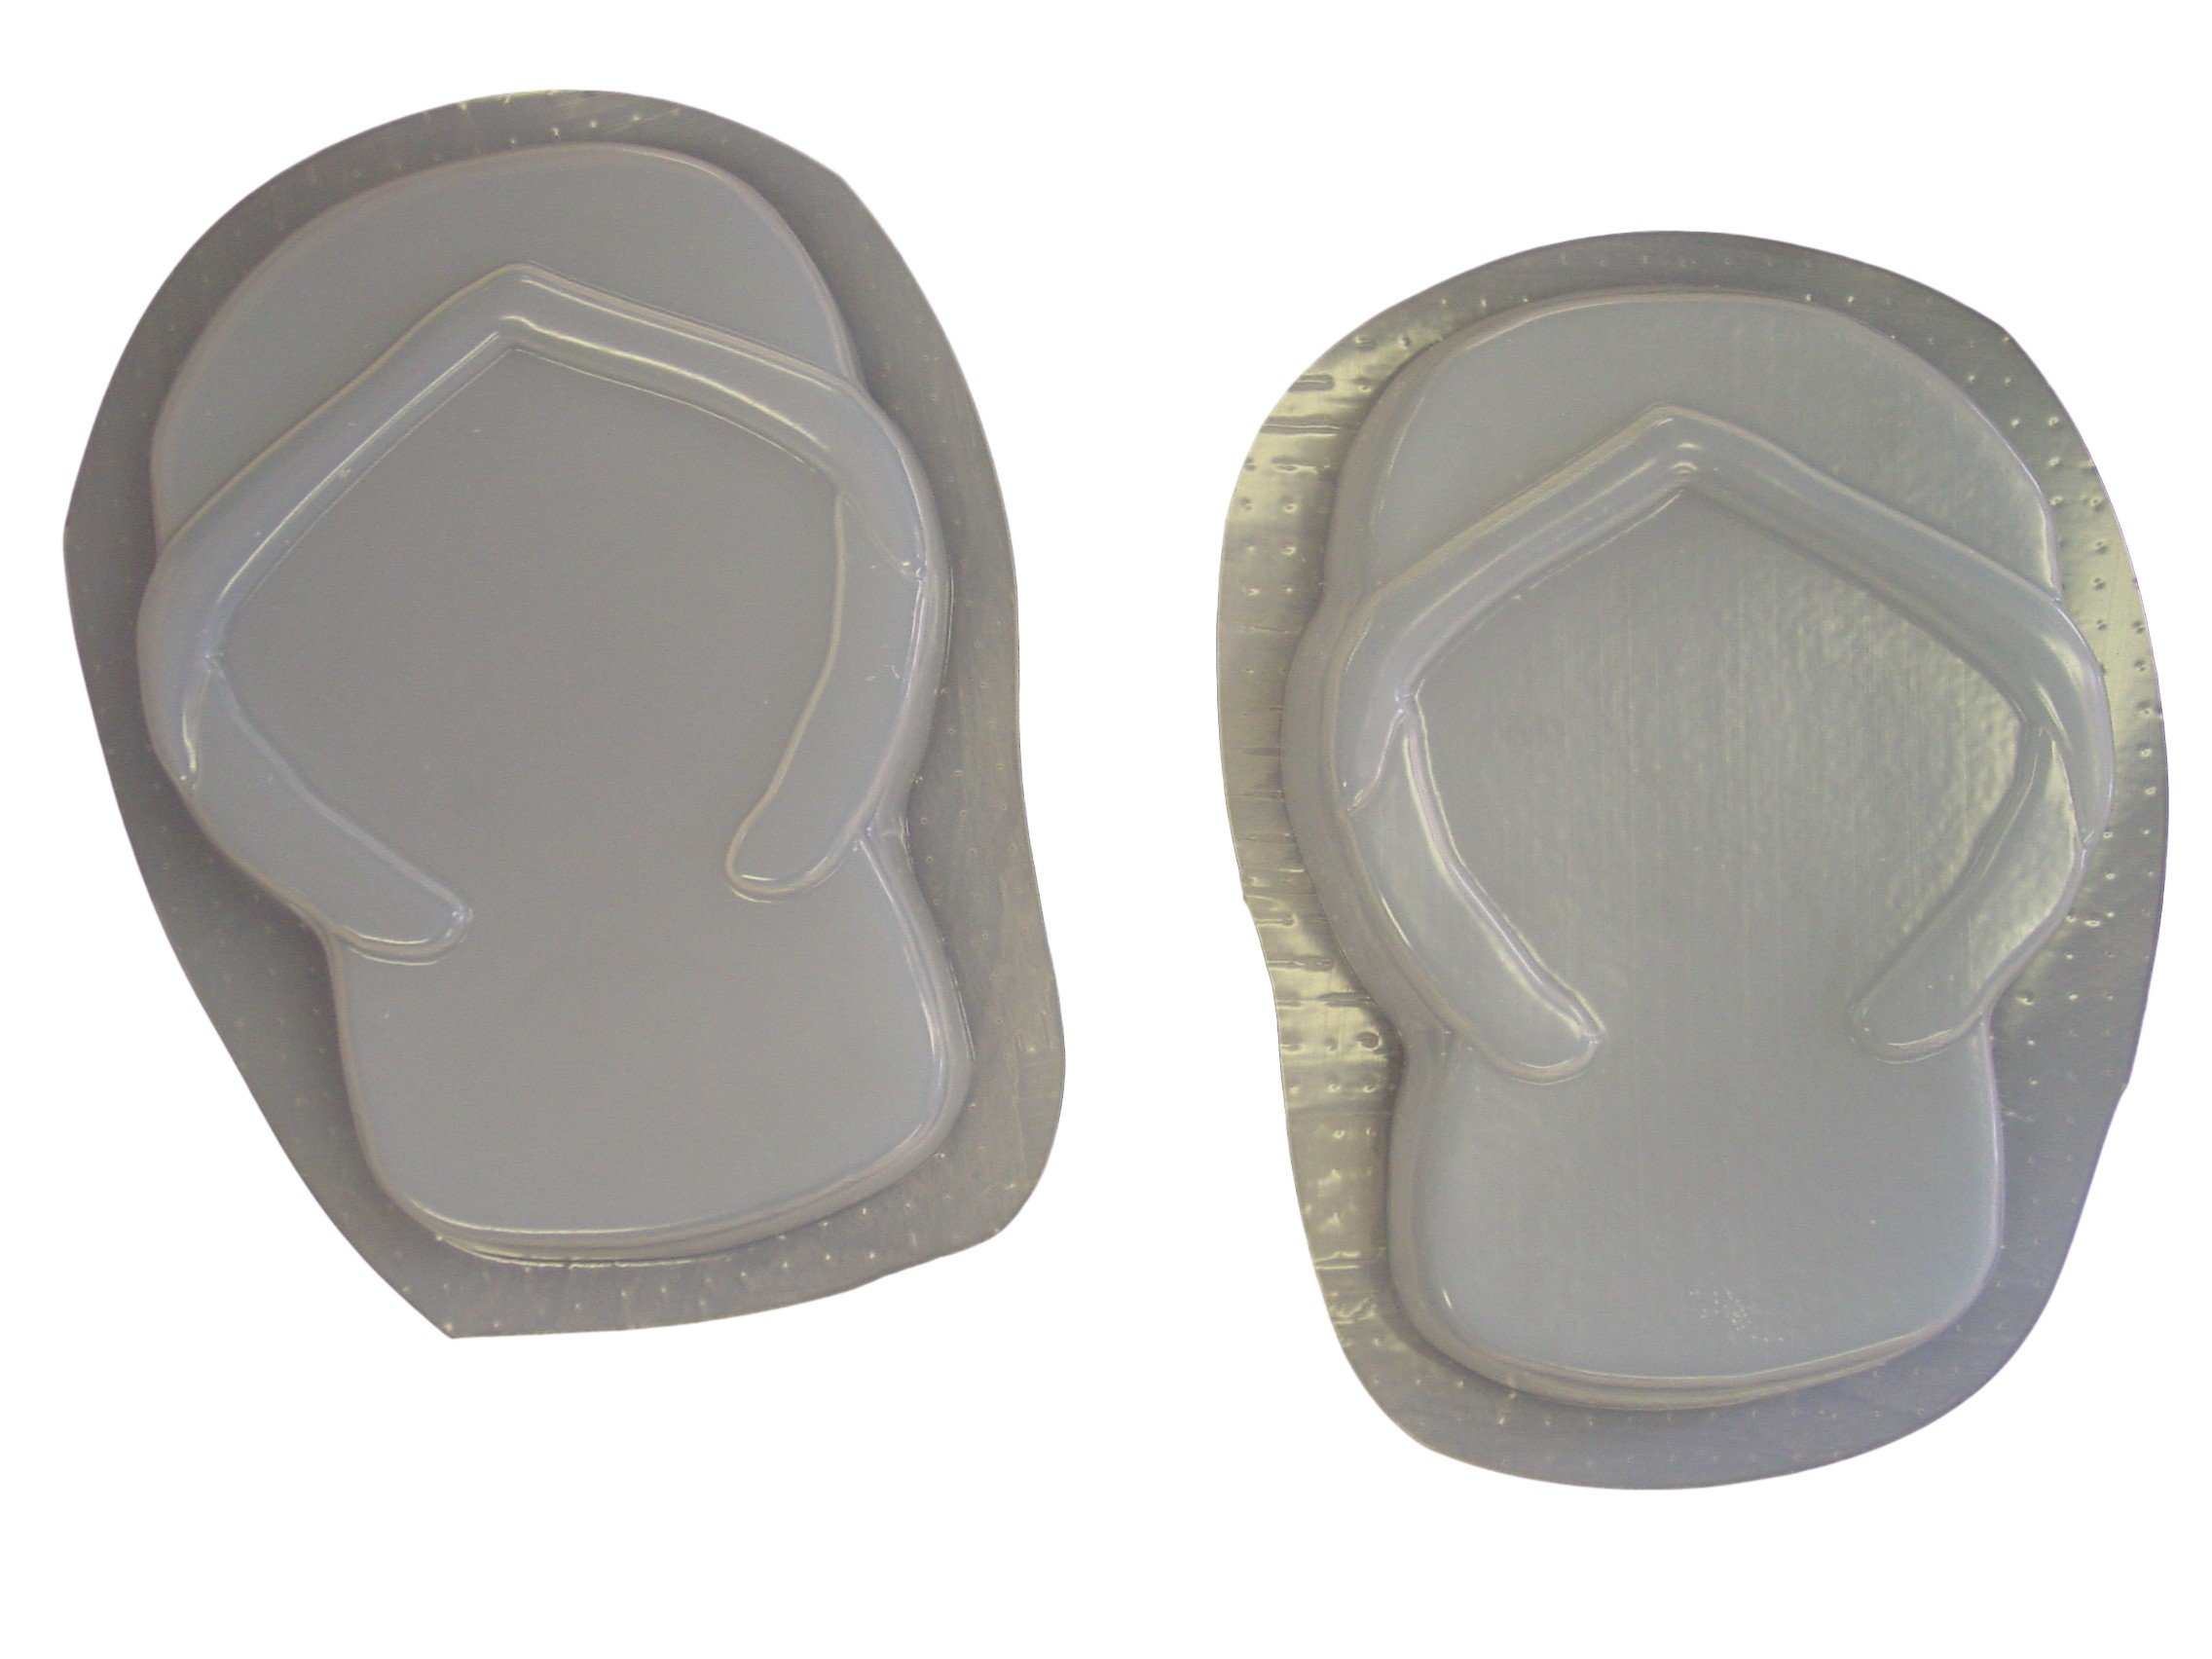 Flip Flops Concrete Plaster Stepping Stone Mold Set 1111